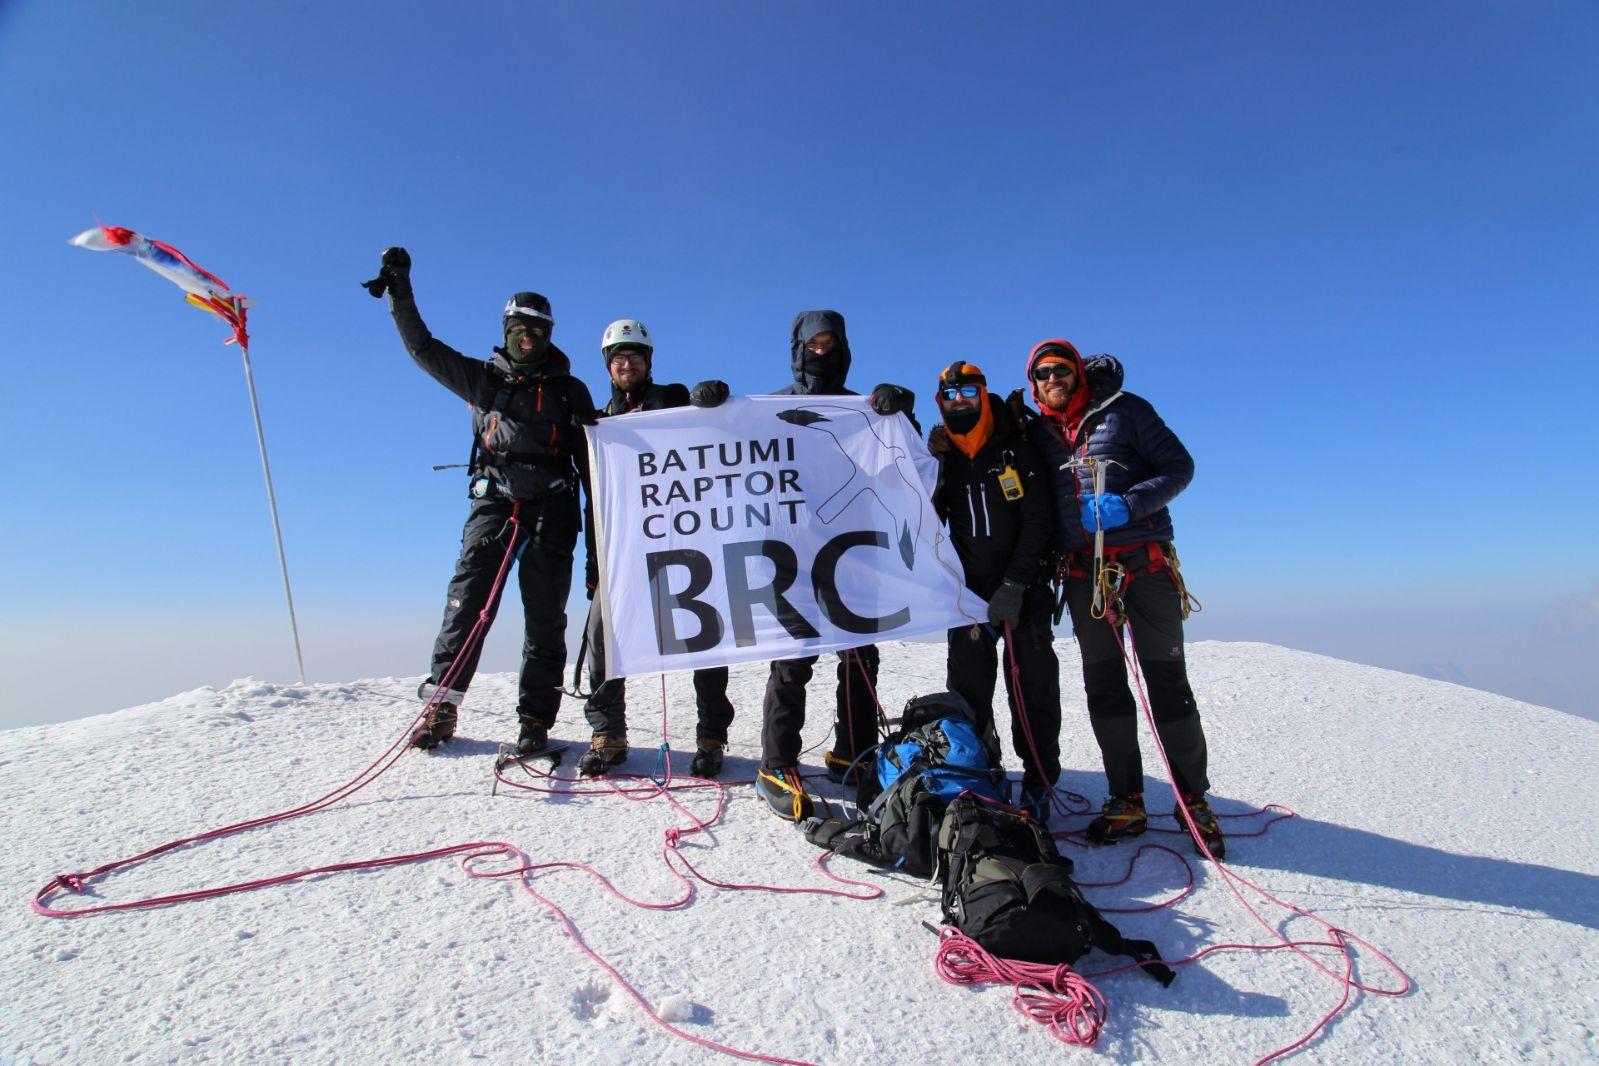 The BRC flag at the summit of Mount Kazbegi. Photo by Brecht Demeulenaer.